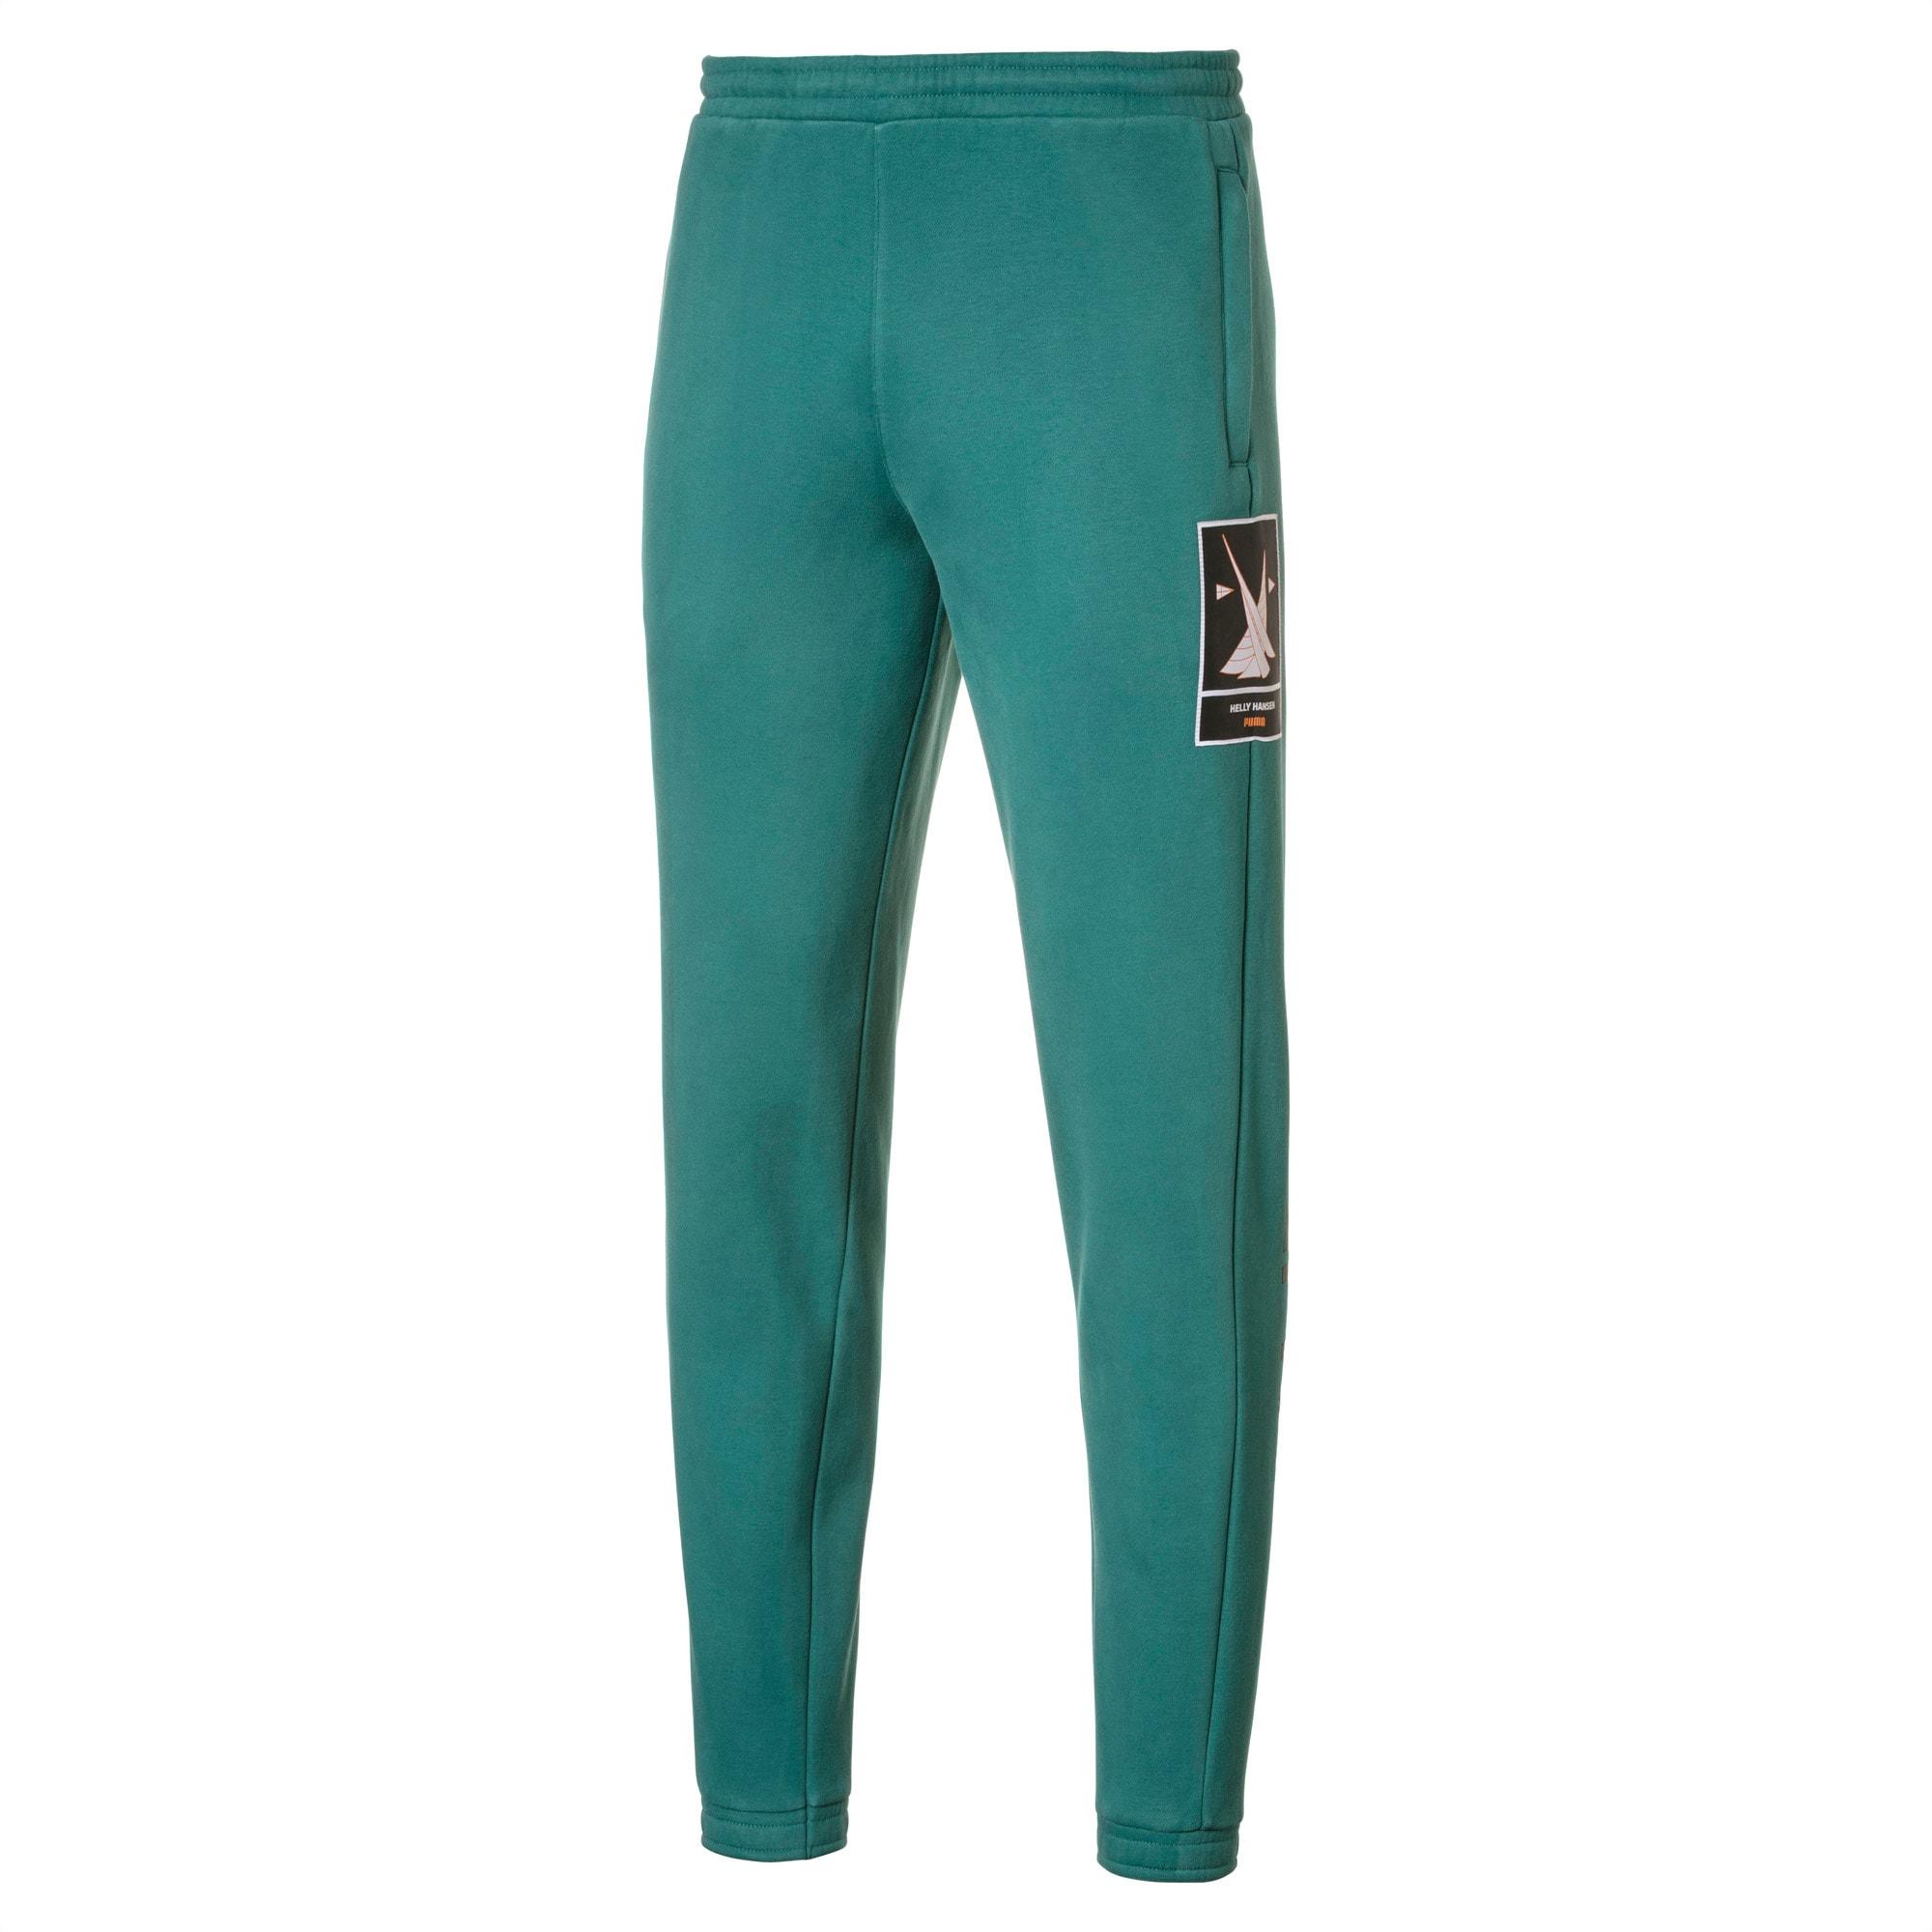 PUMA x HELLY HANSEN Fleece Track Pants